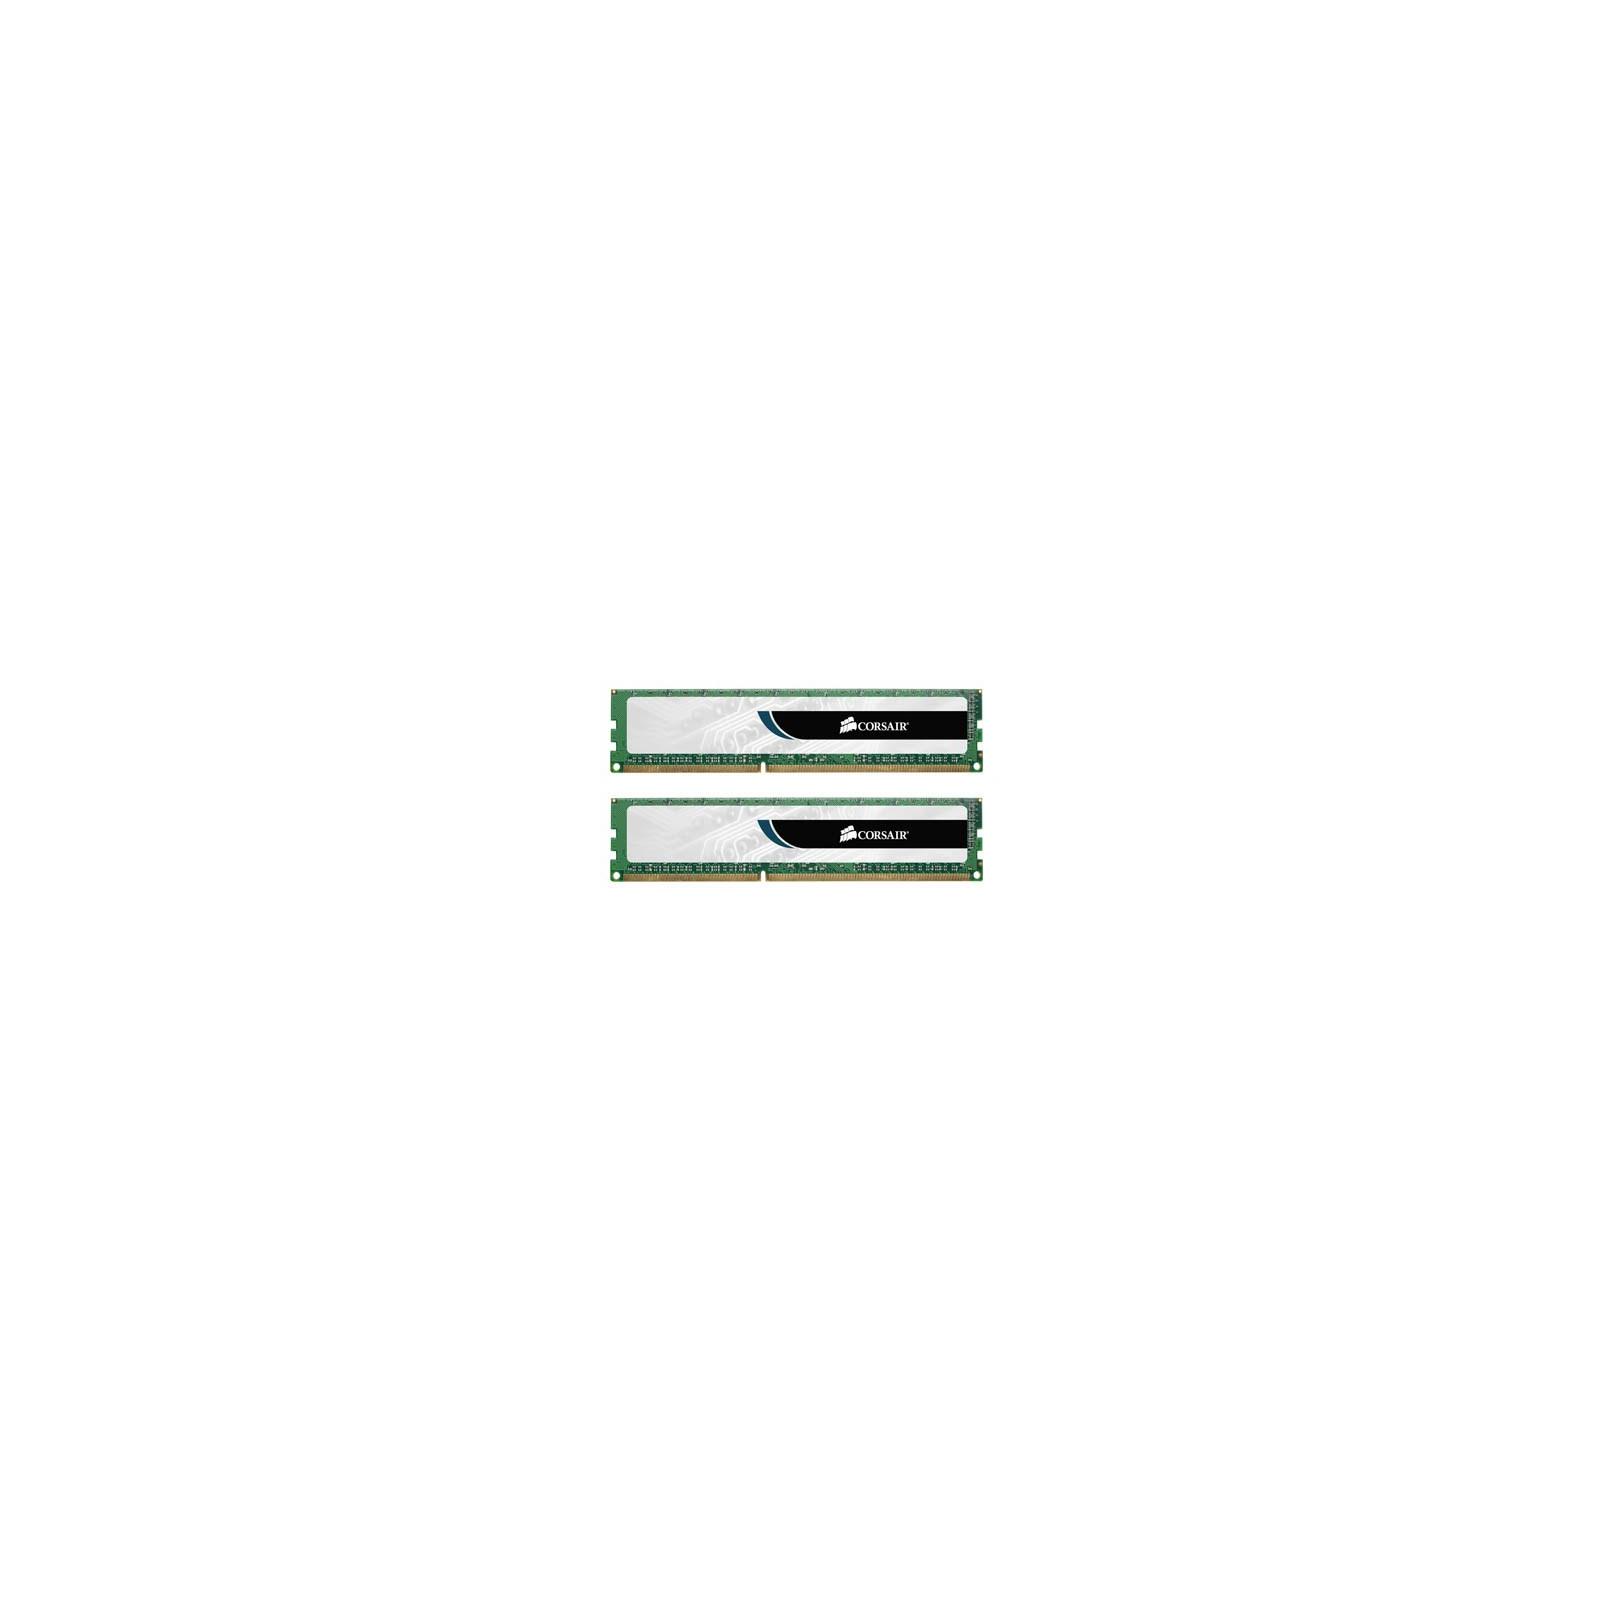 Модуль памяти для компьютера DDR3 2GB 1333 MHz CORSAIR (VS2GB1333D3 G)